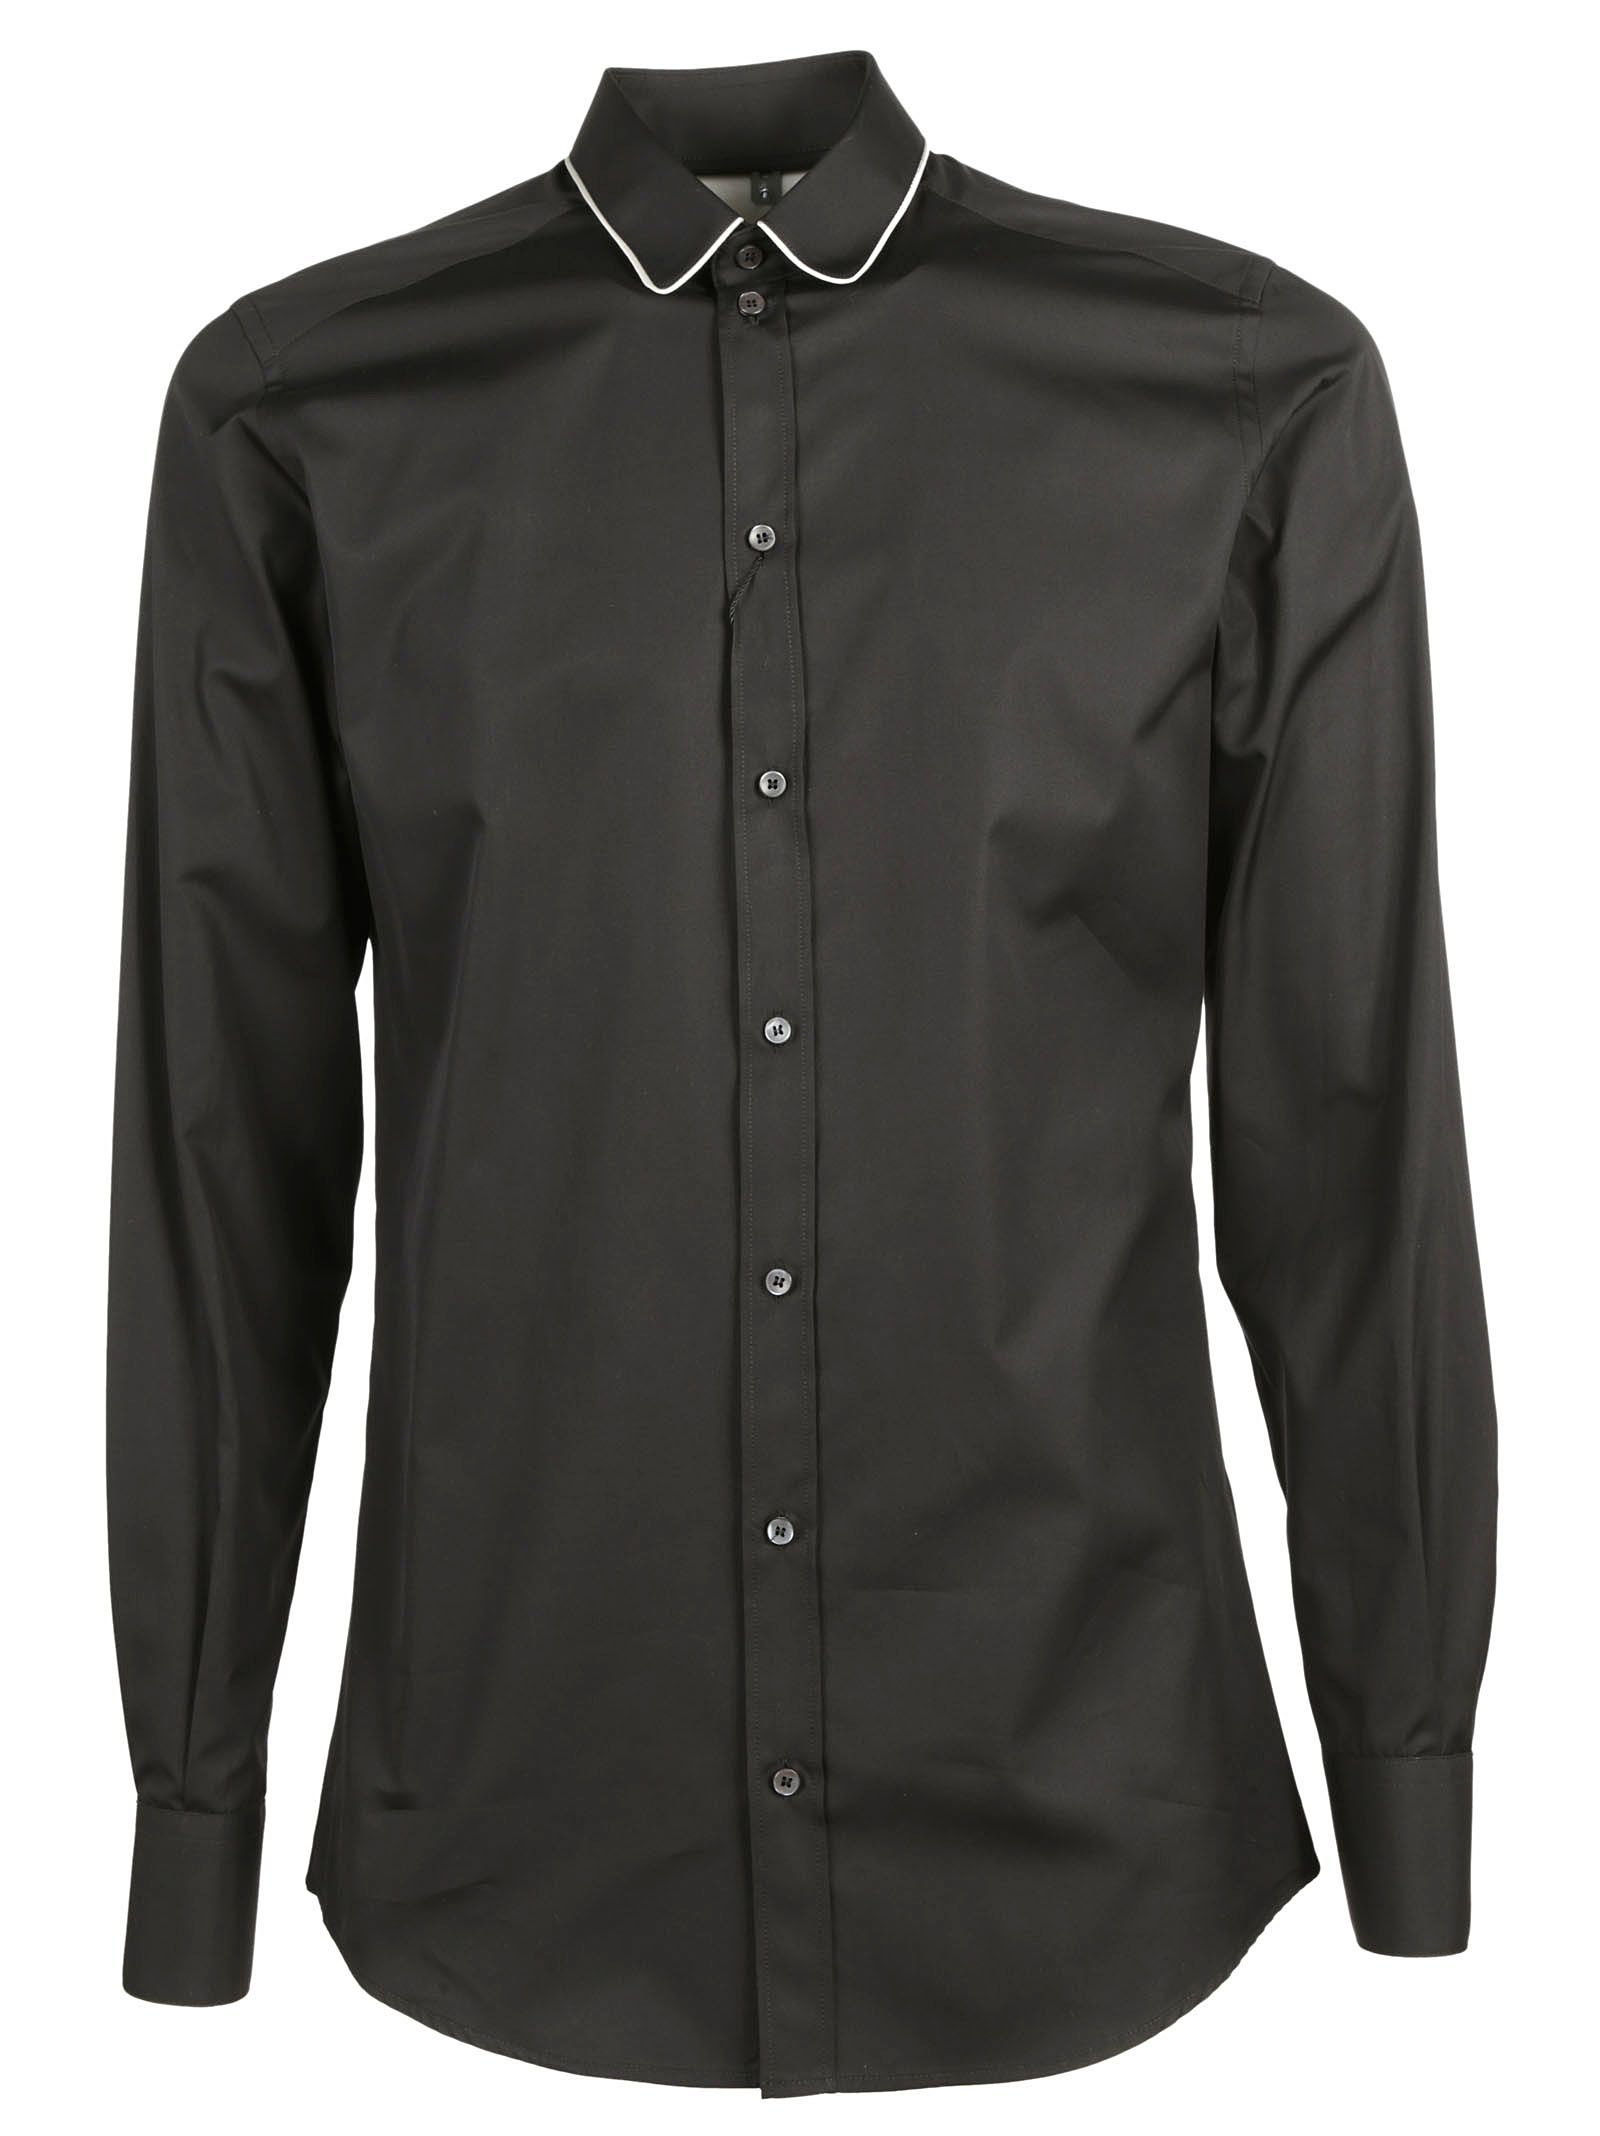 Dolce & Gabbana Piped Trim Shirt